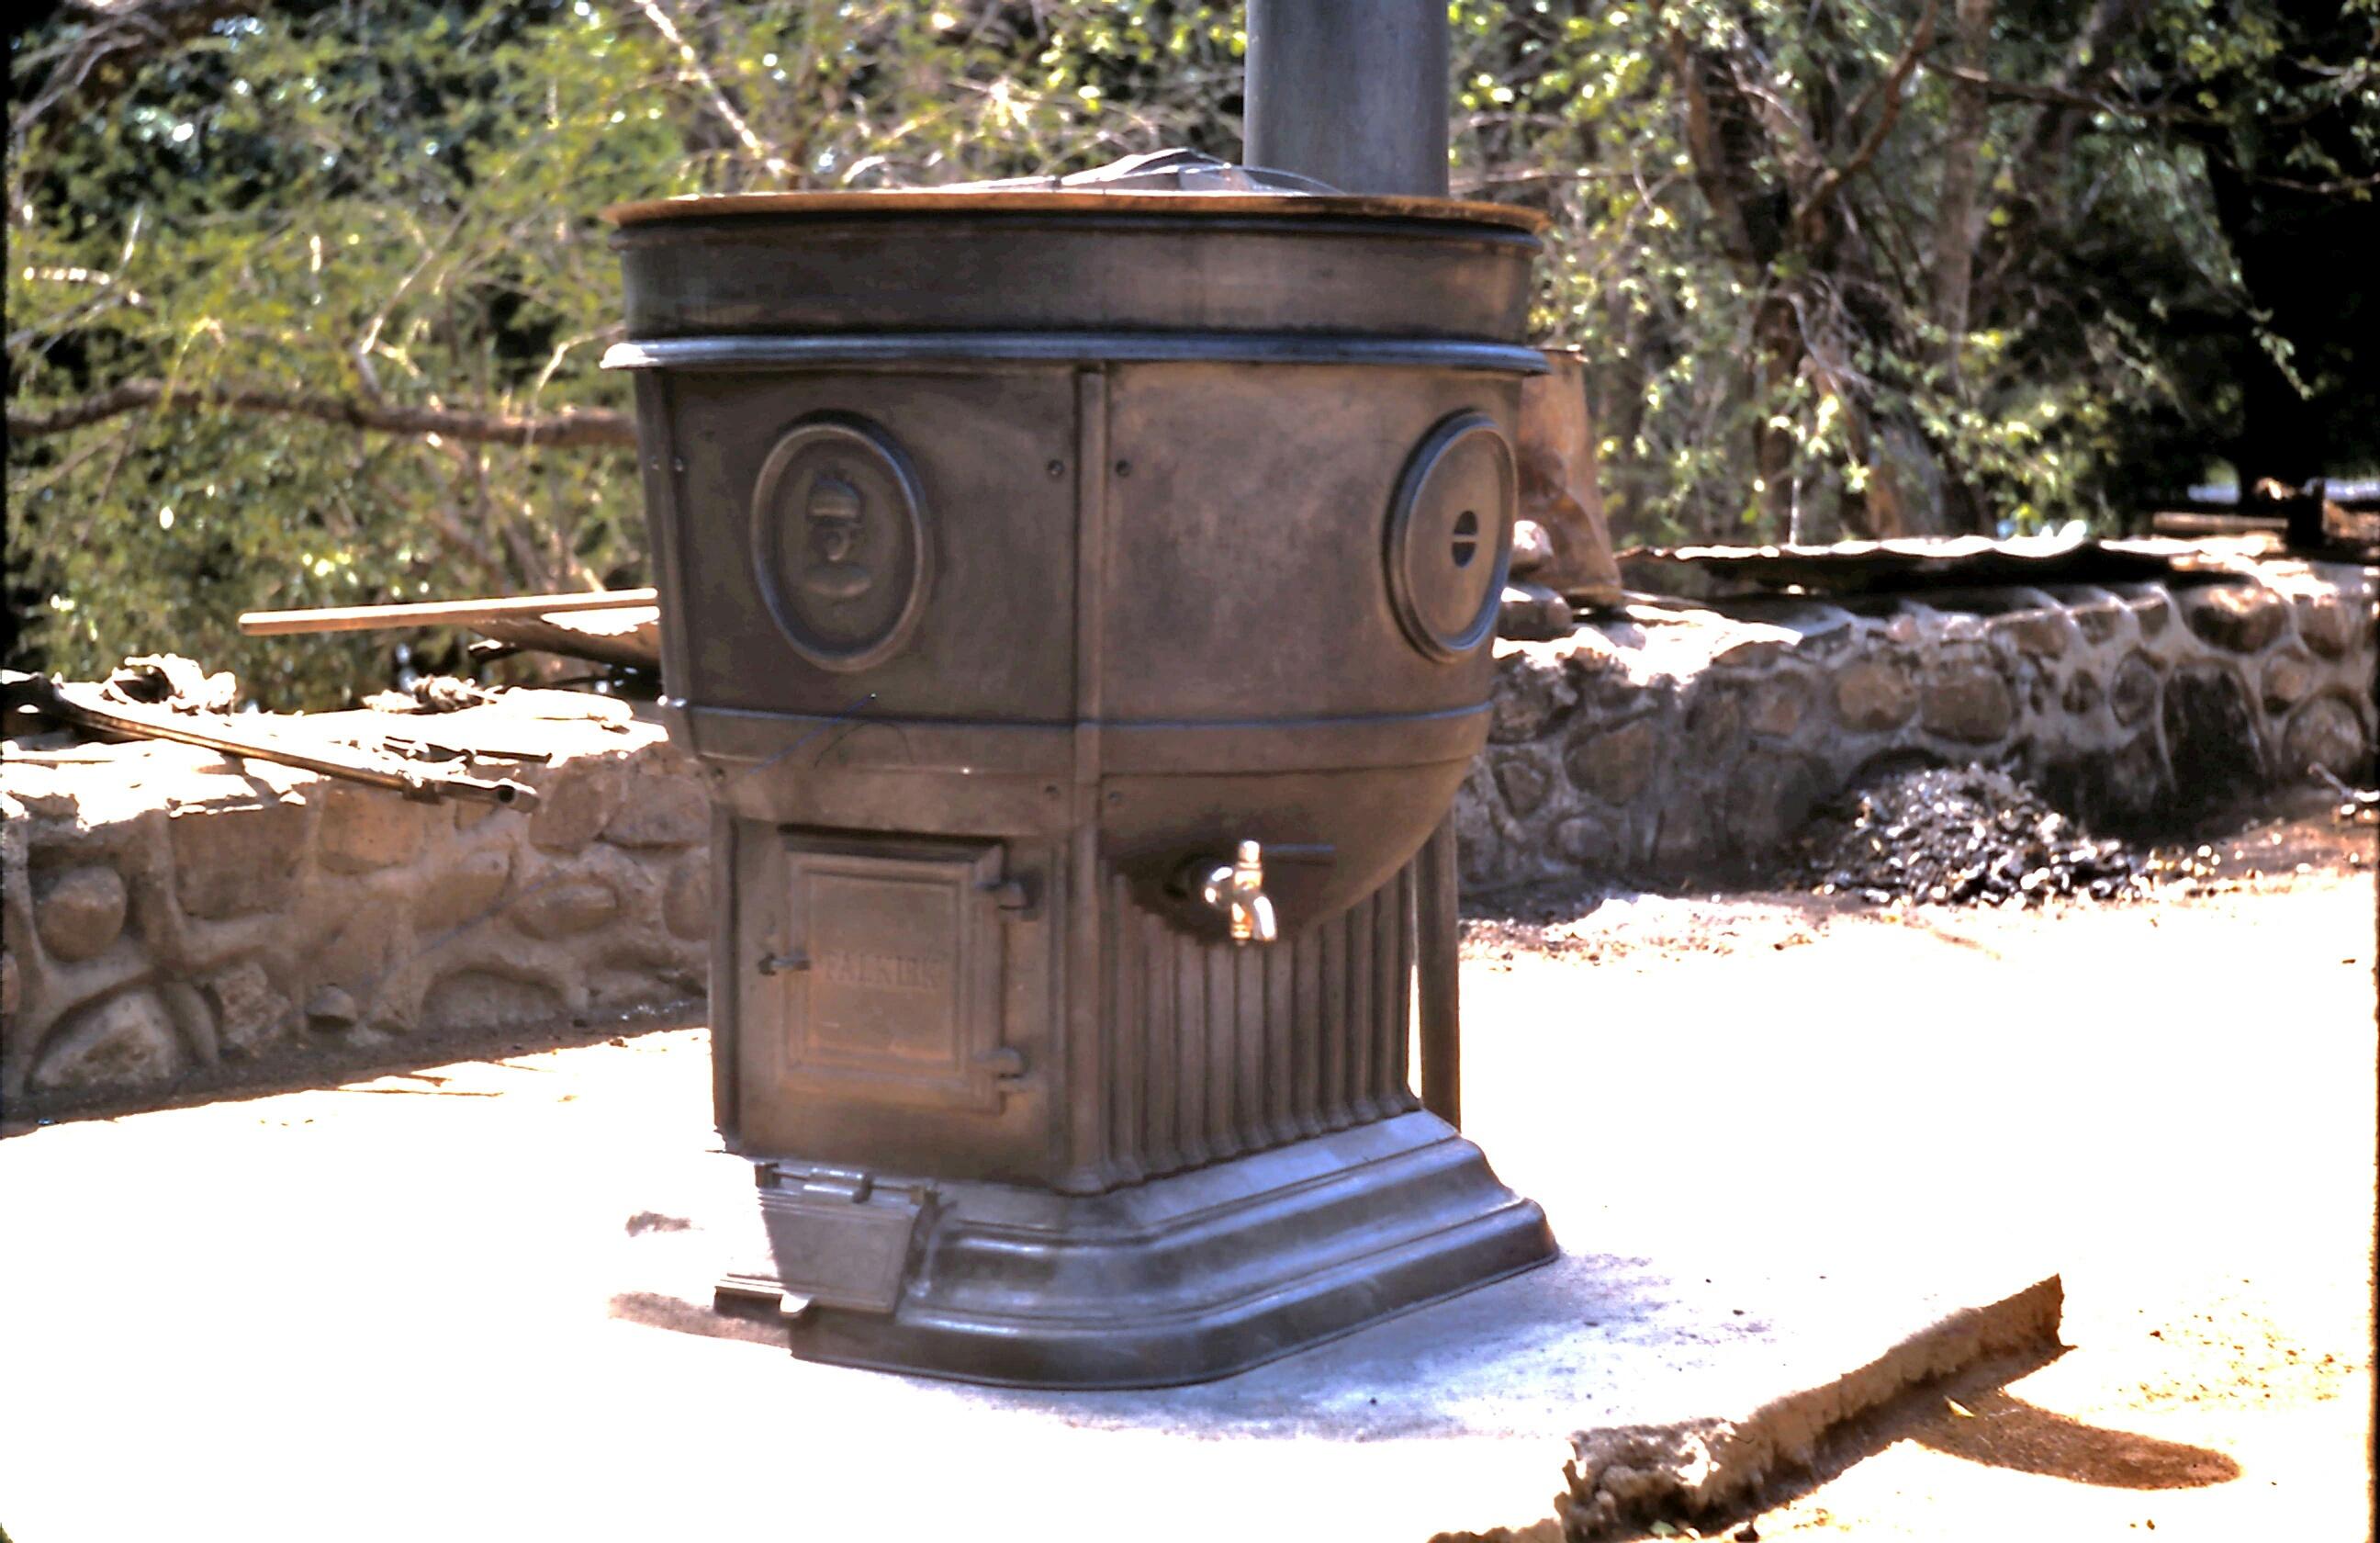 Water Boiler made in Falkirk